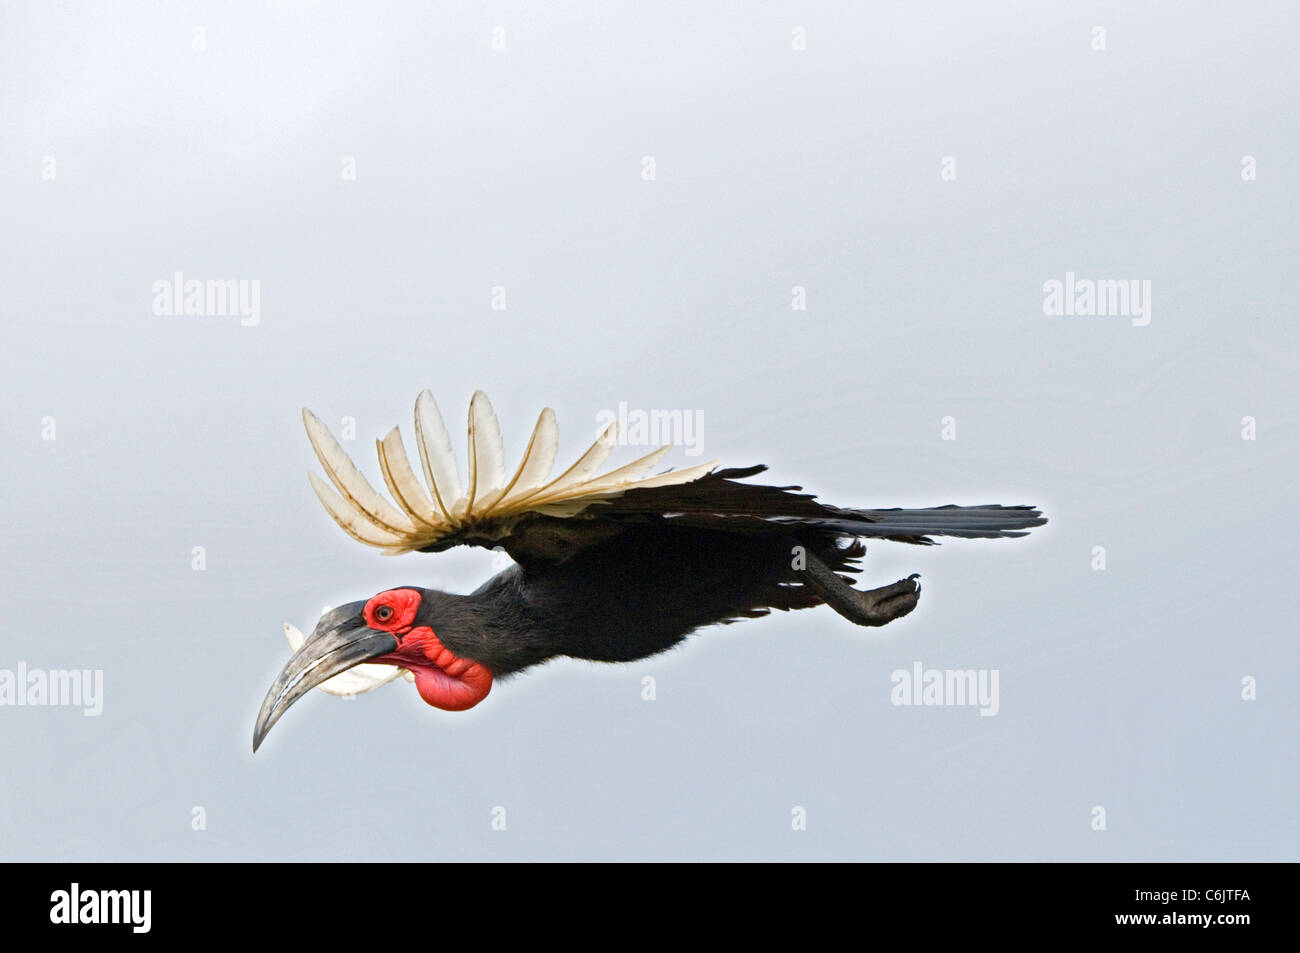 Bucero tierra austral en vuelo. Foto de stock